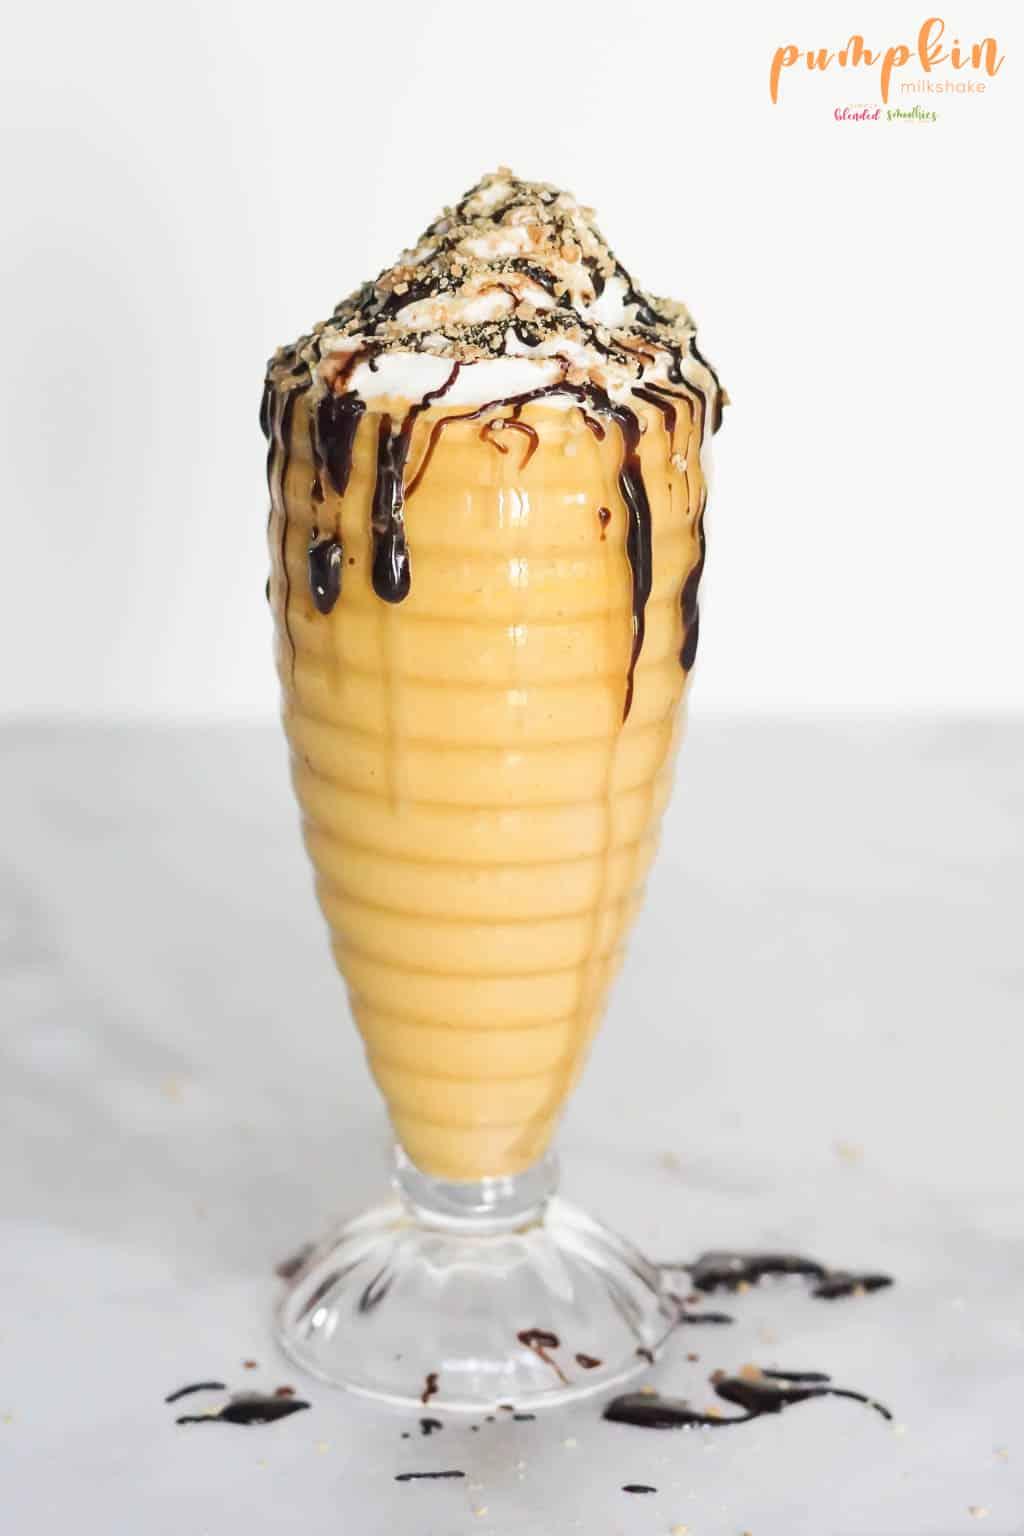 Pumpkin Milkshake Recipe - delicious pumpkin milkshake recipe